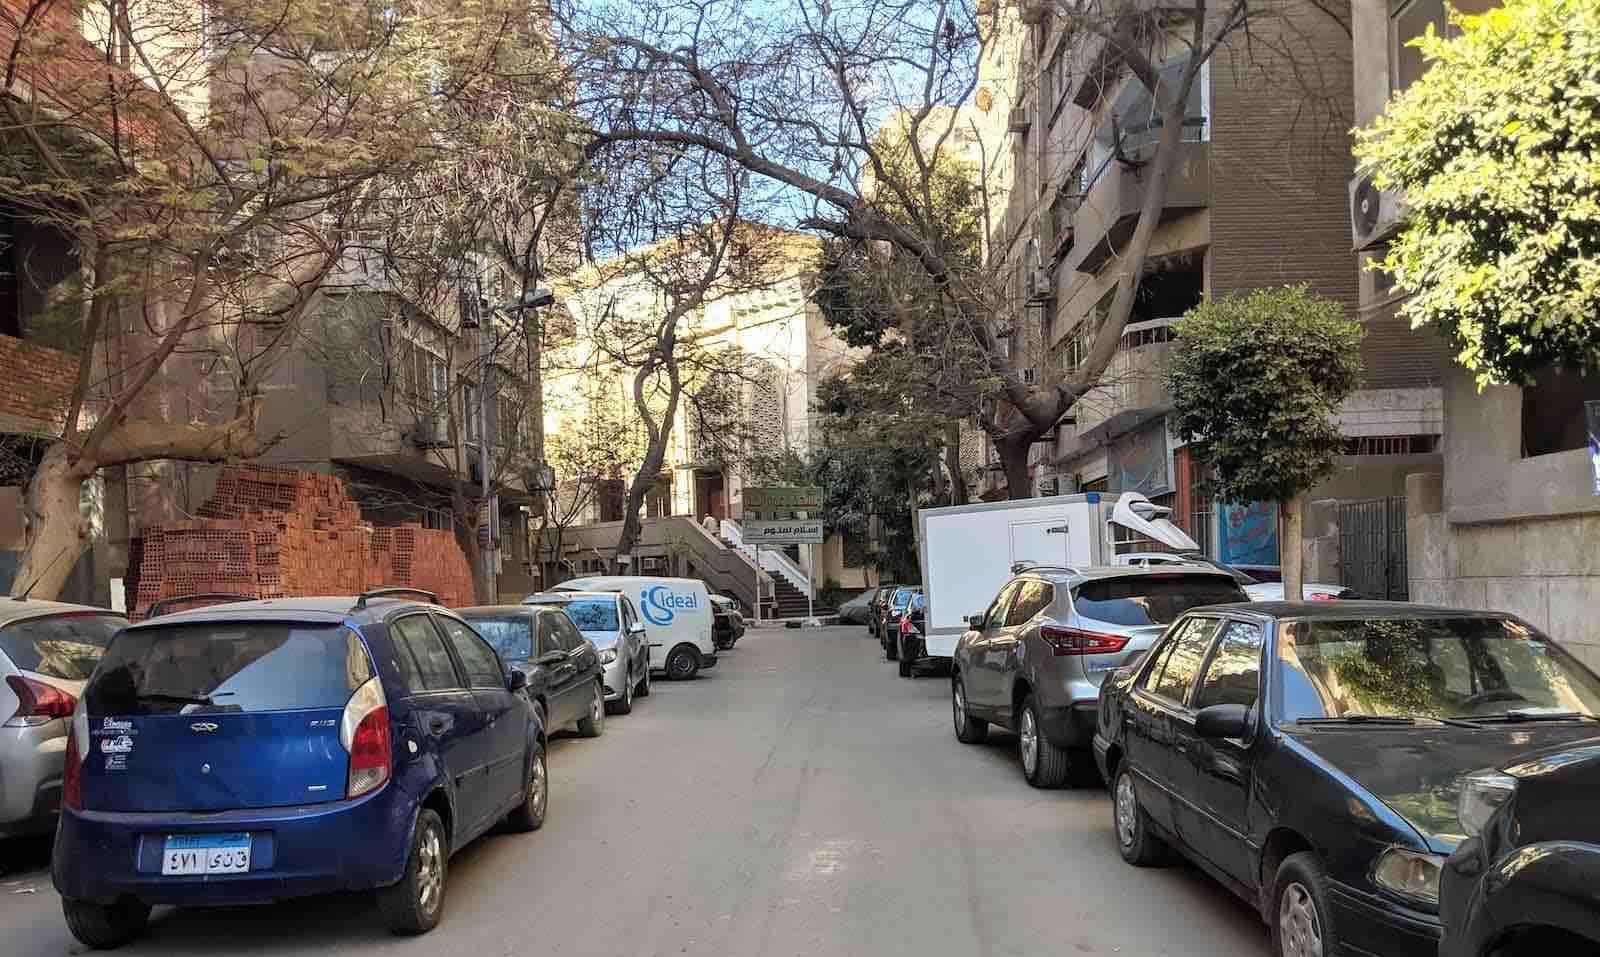 Neighbourhoods of Cairo - Dokki - Cars on street